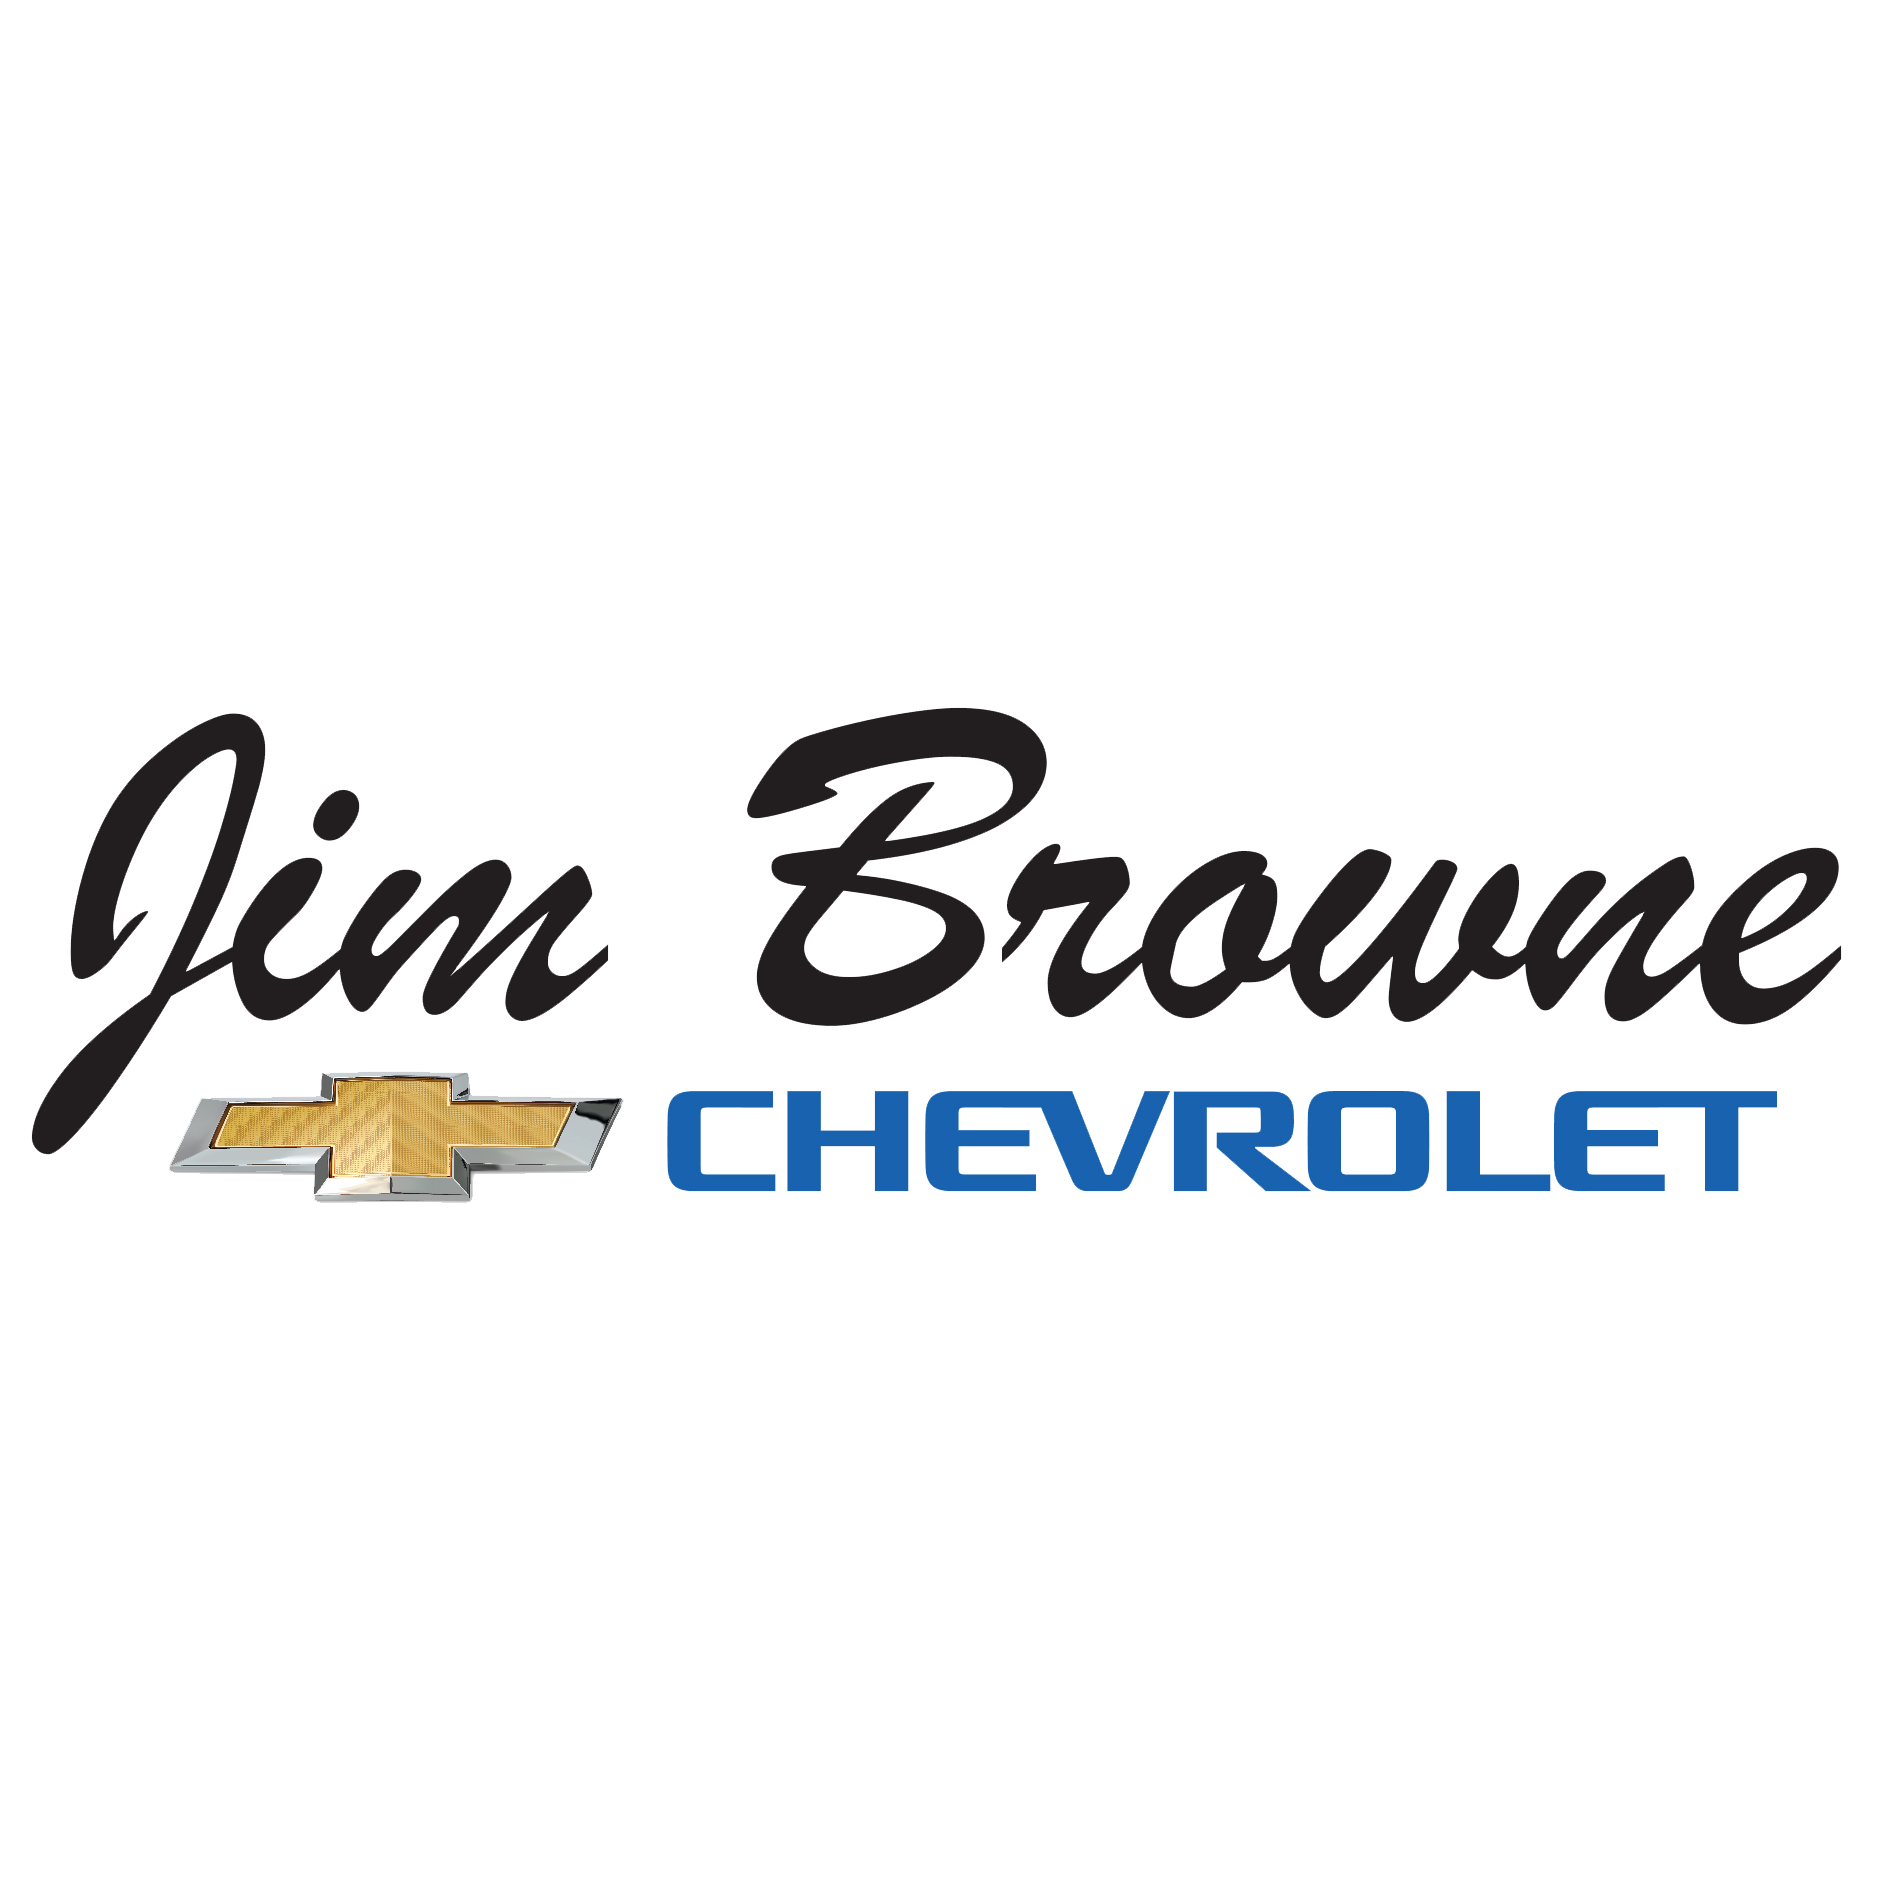 Jim Browne Chevrolet - Tampa, FL - Auto Dealers